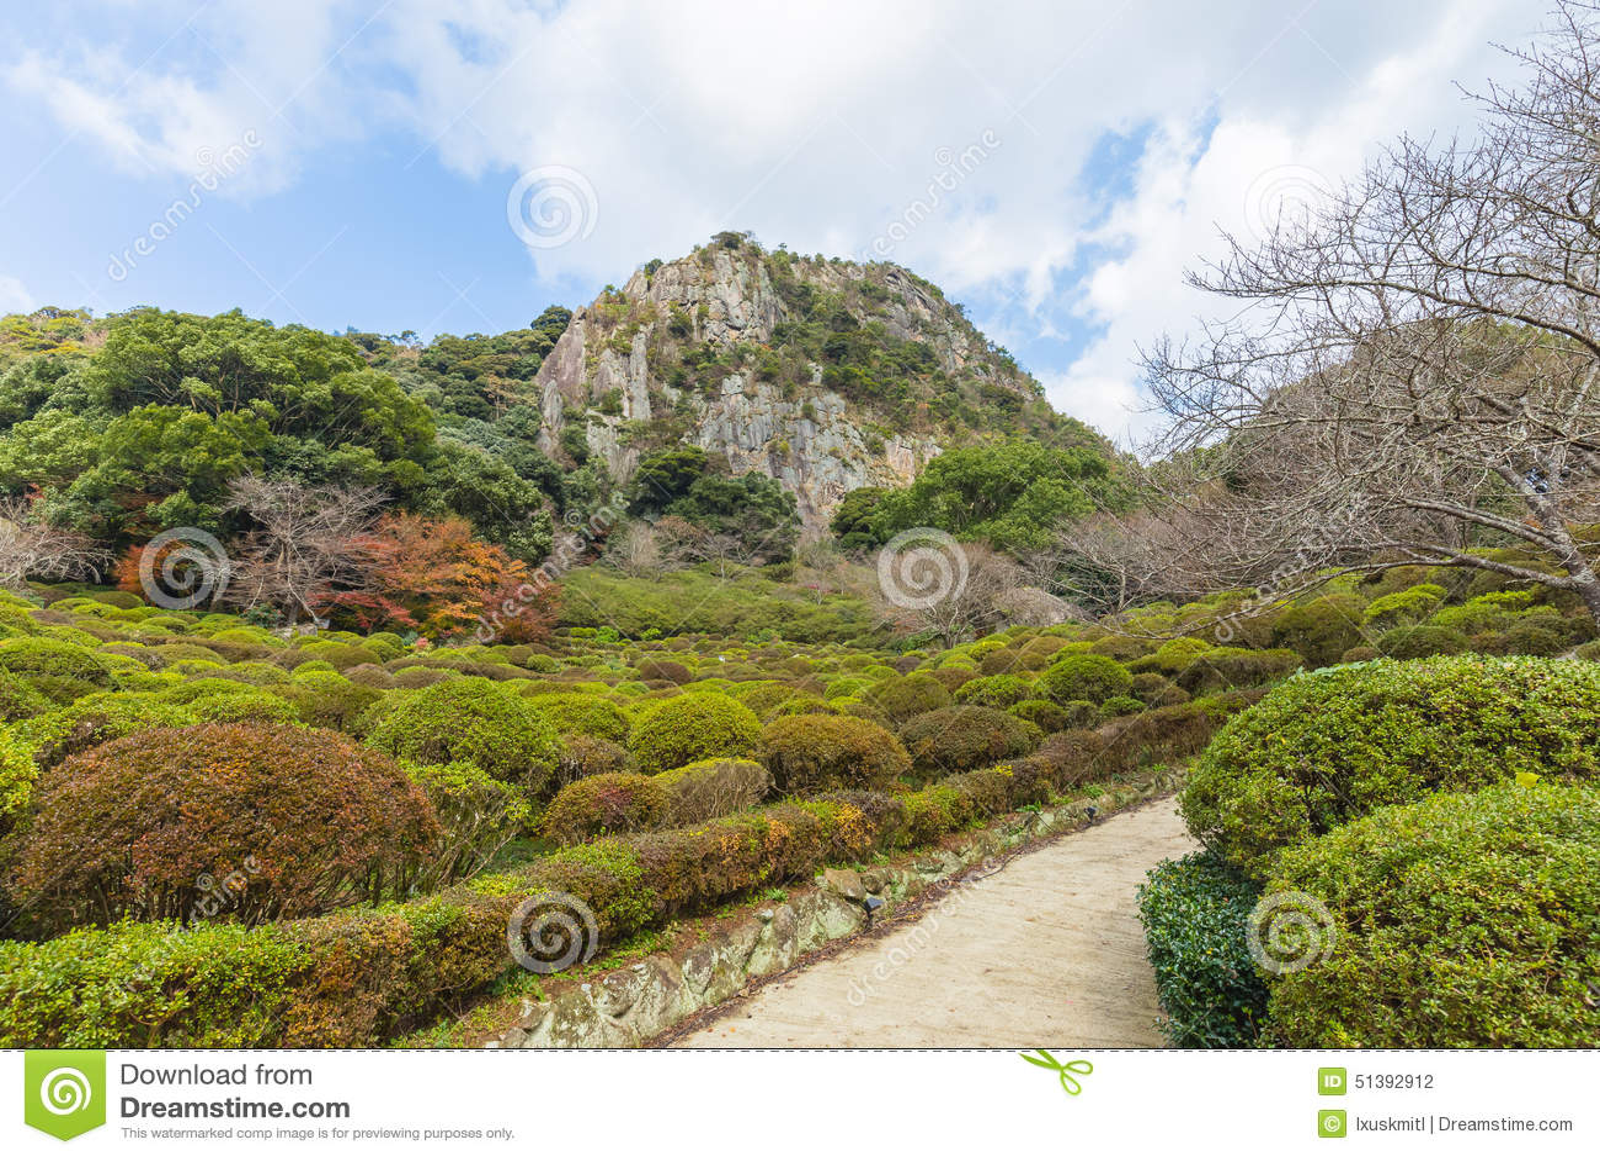 Mifuneyama Rakuen Garden In Saga Northern Kyushu Japan Stock